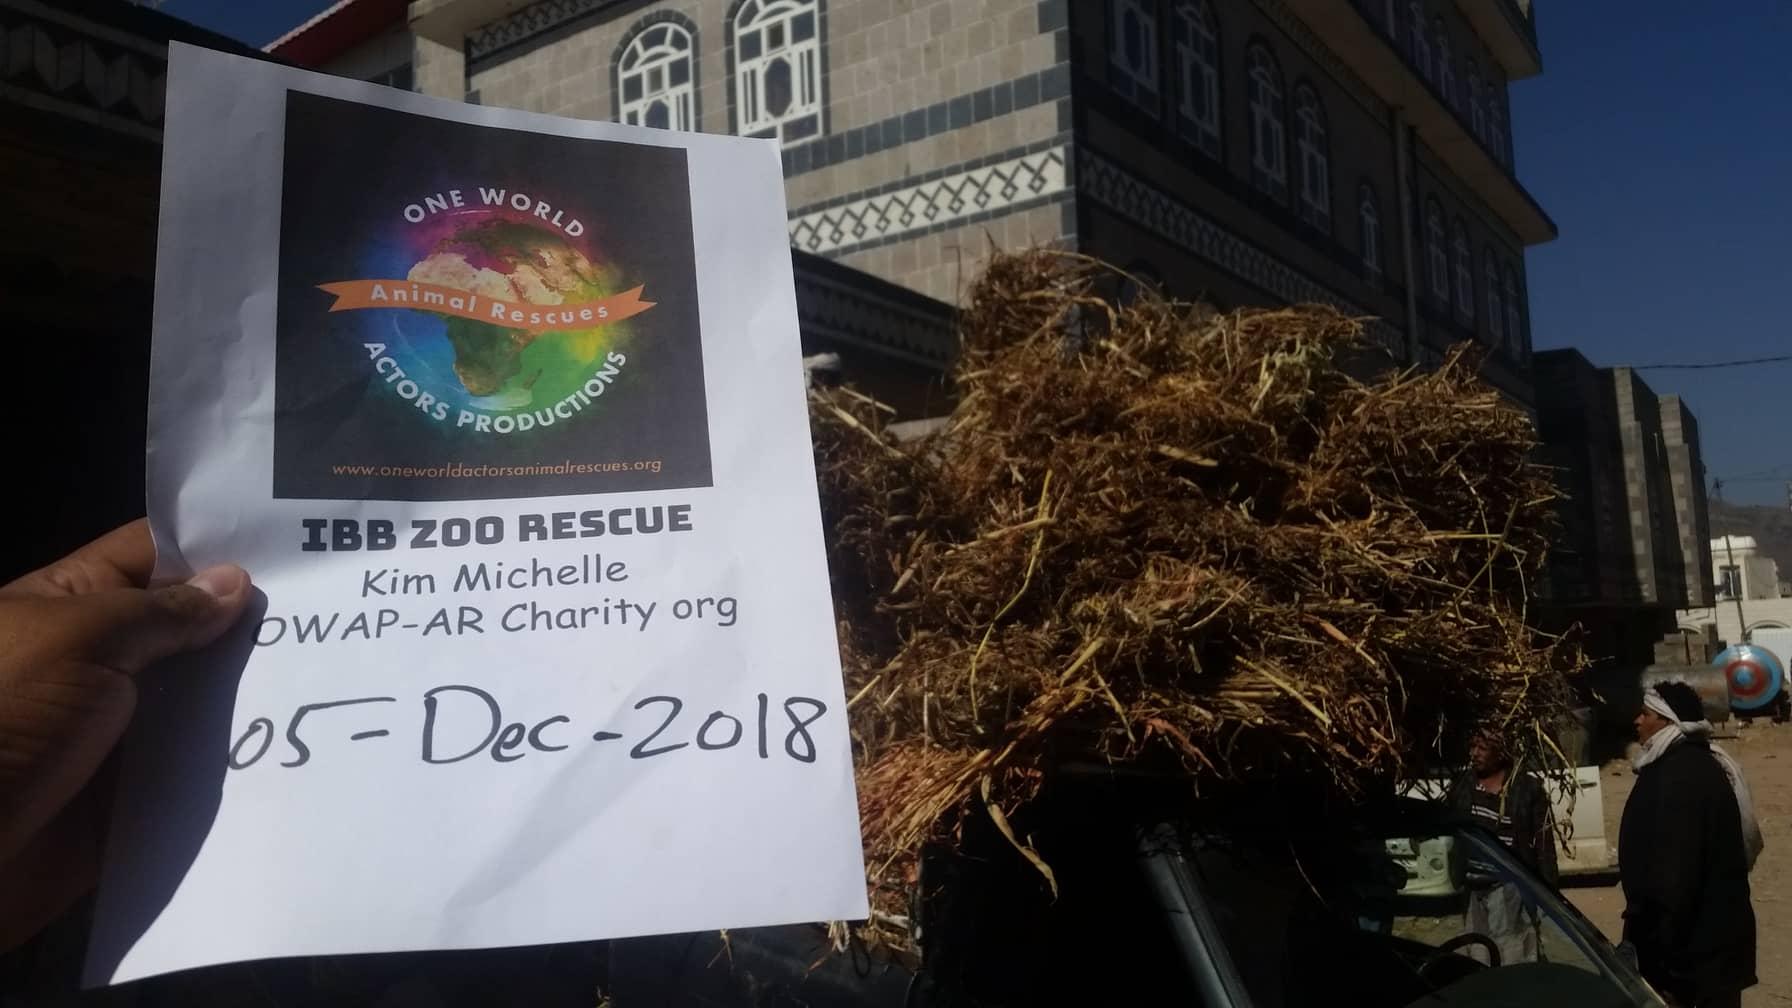 ibb zoo unloading delivery fodder for camesl horses and donkeys   5 DEC 2018 by OWAPAR hisham with sign zabedi supplier from hodeidah.jpg